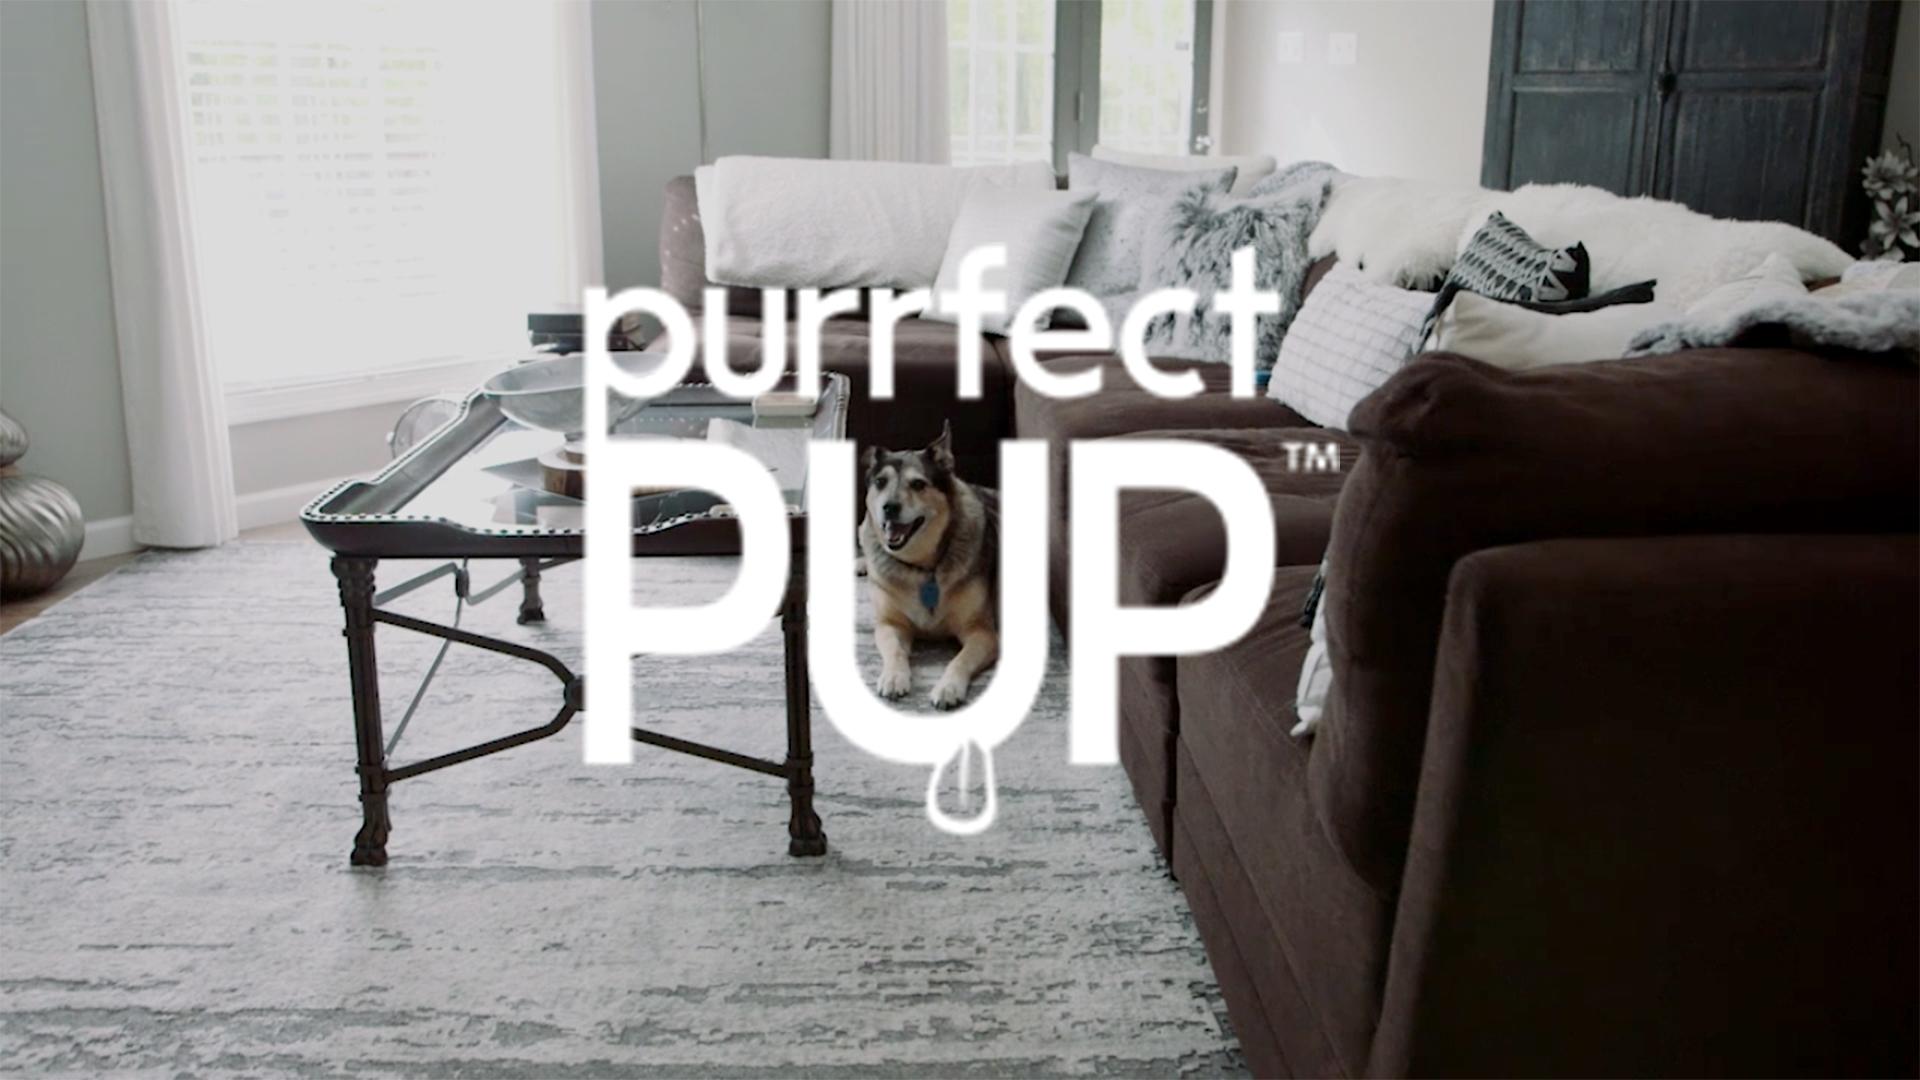 Purrfect Pup thumbnail.jpg